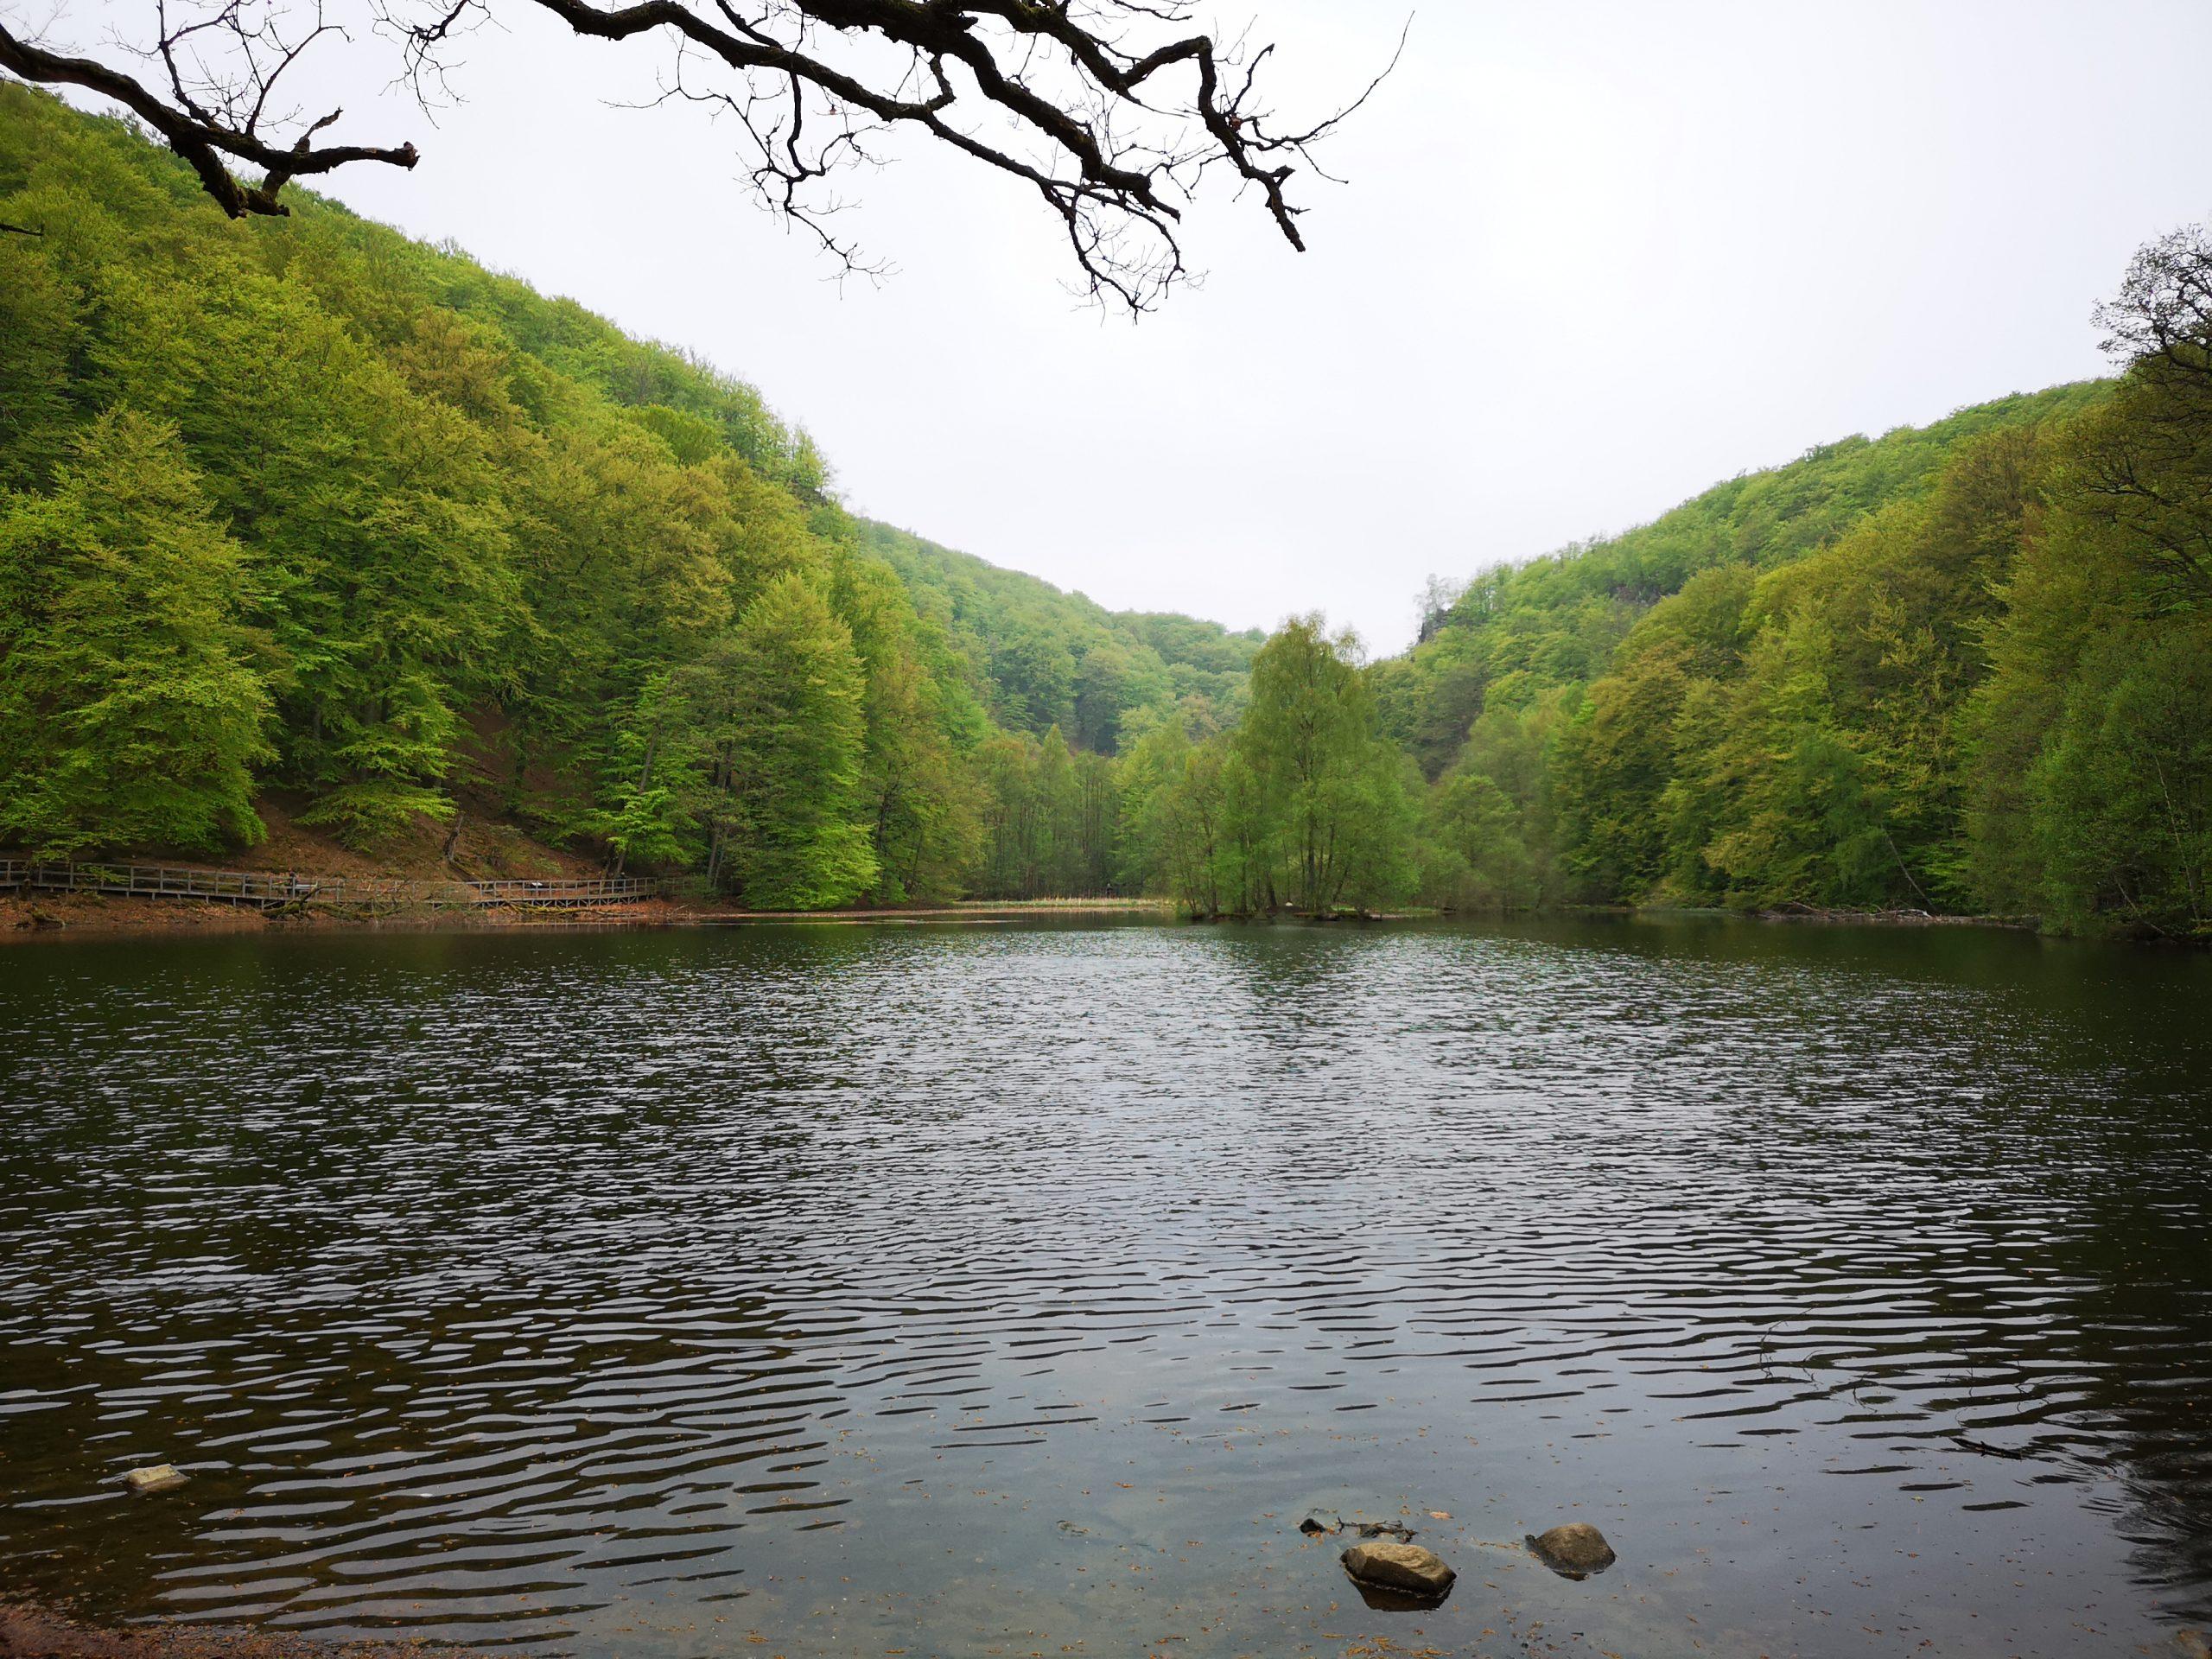 Soderasen National Park: Popular Tourist place to Visit in Sweden